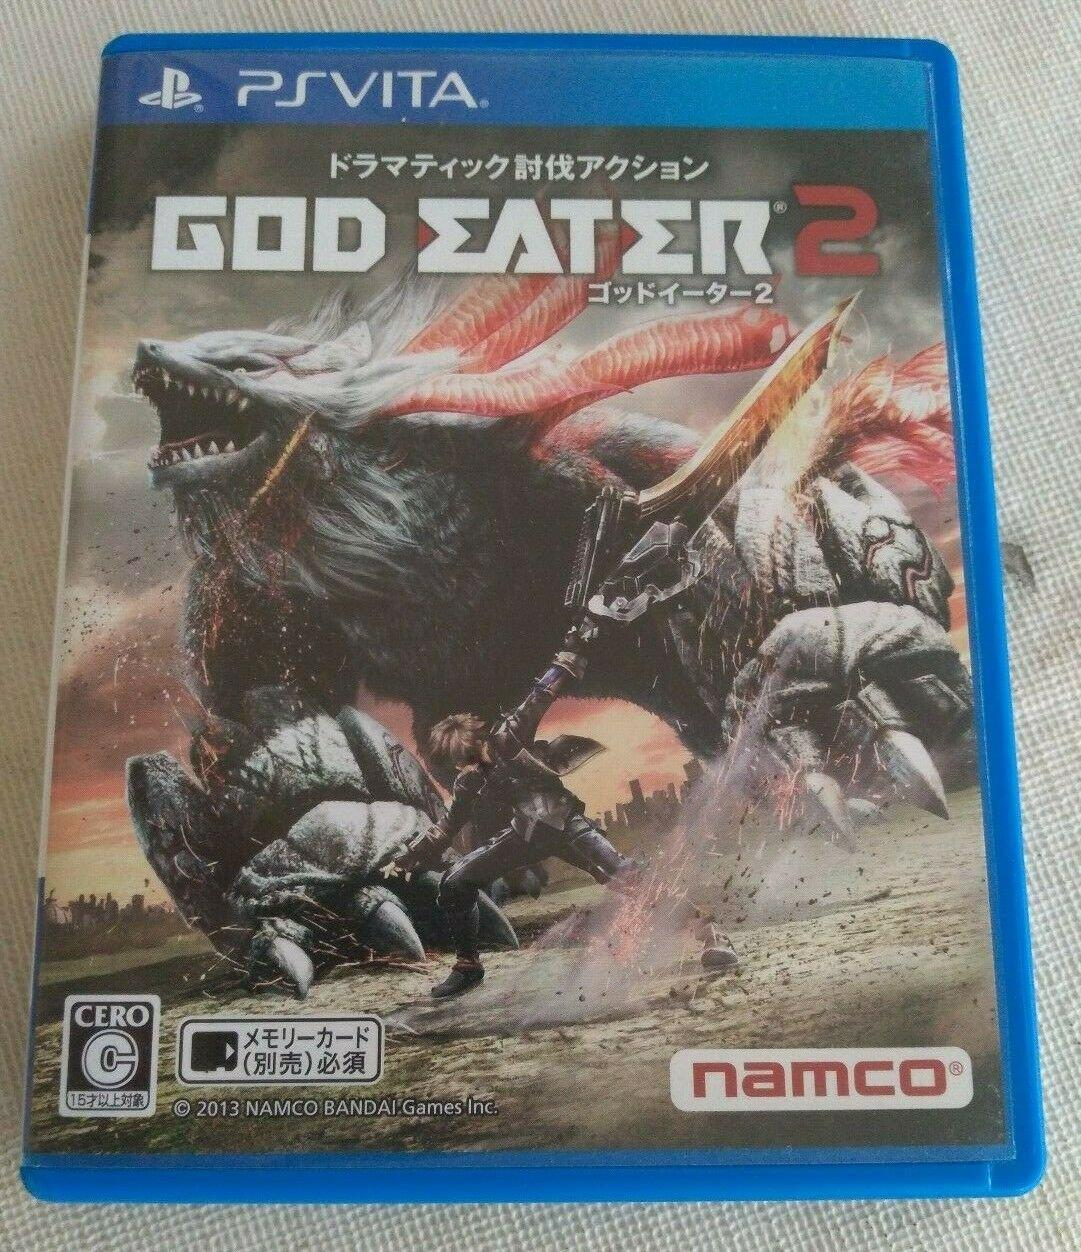 God Eater 2 (Sony PlayStation Vita, 2013) Japan Import PS Vita